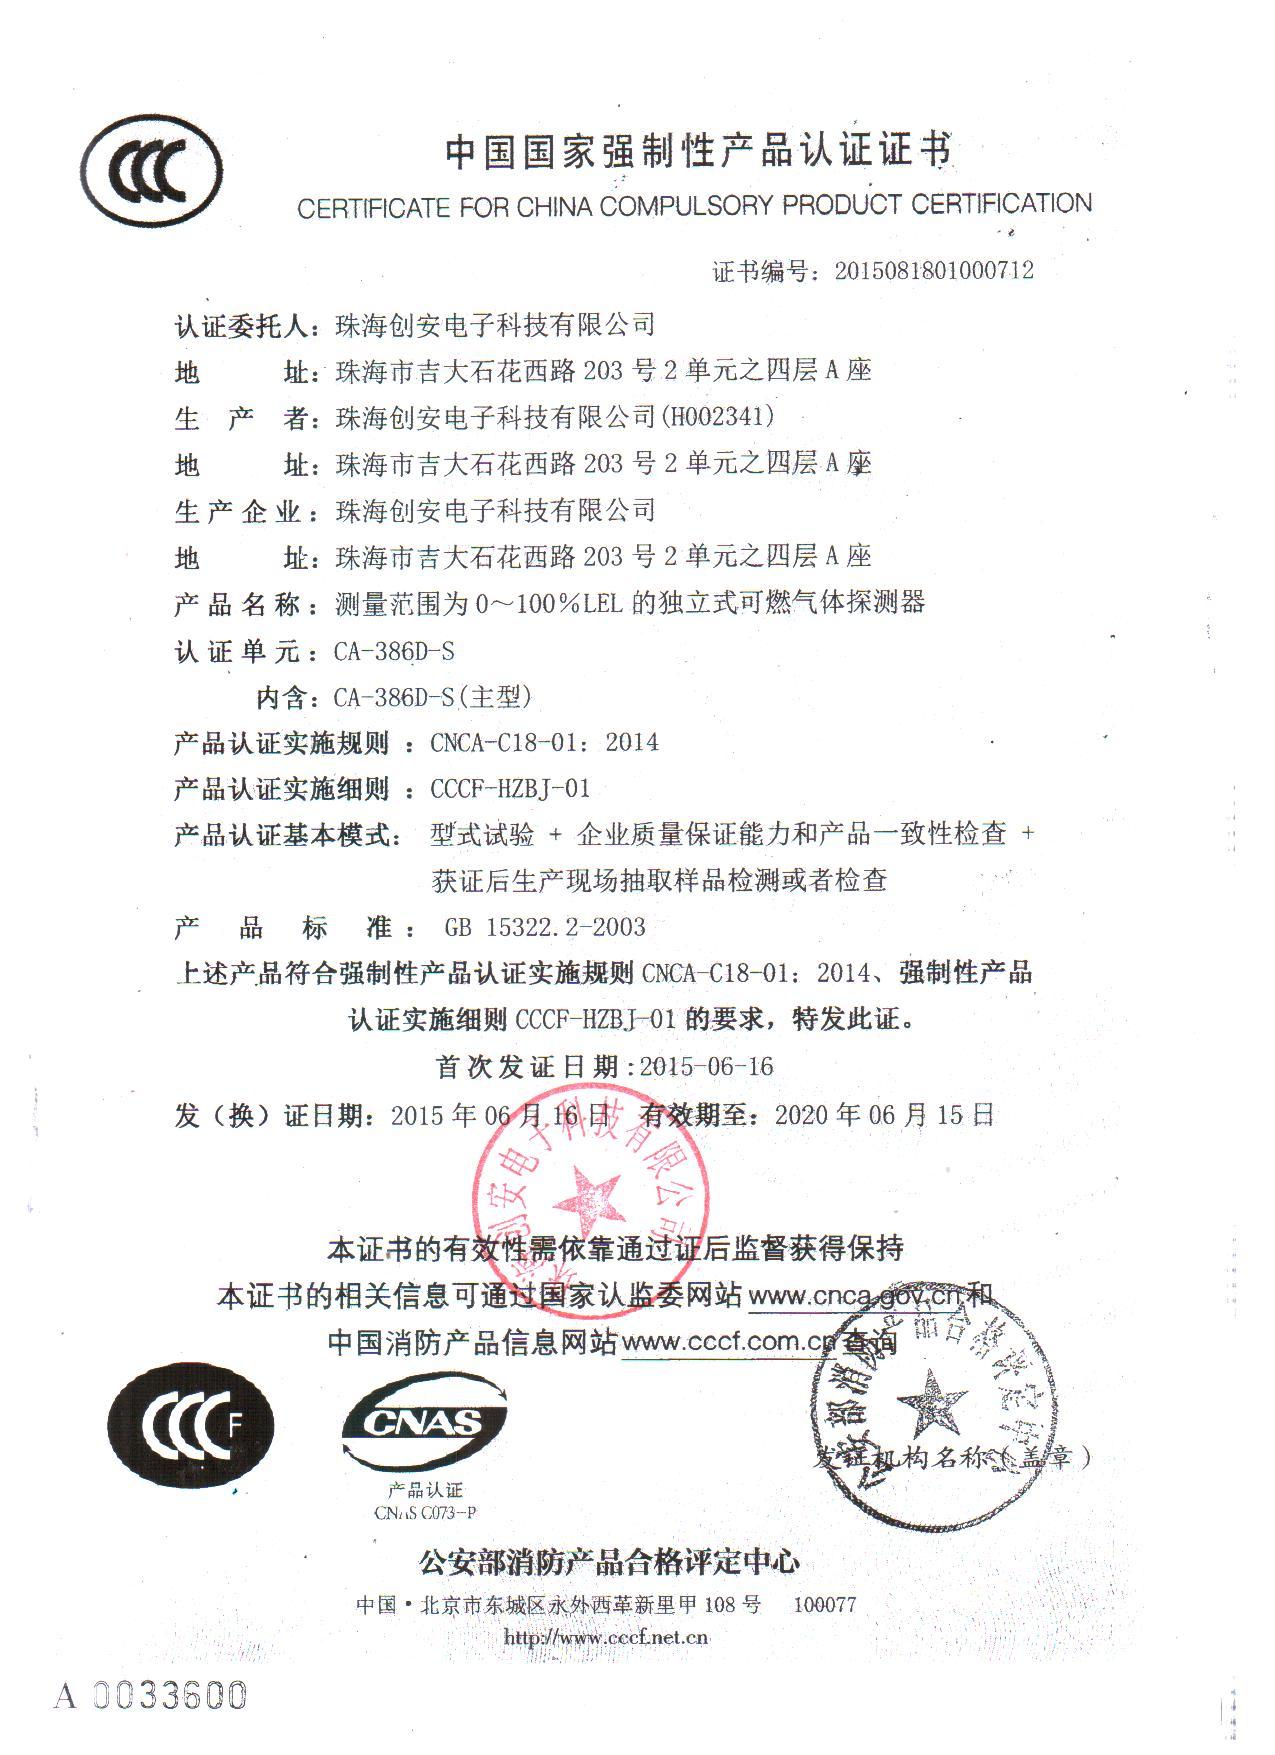 CA-386D-S 认证.jpg